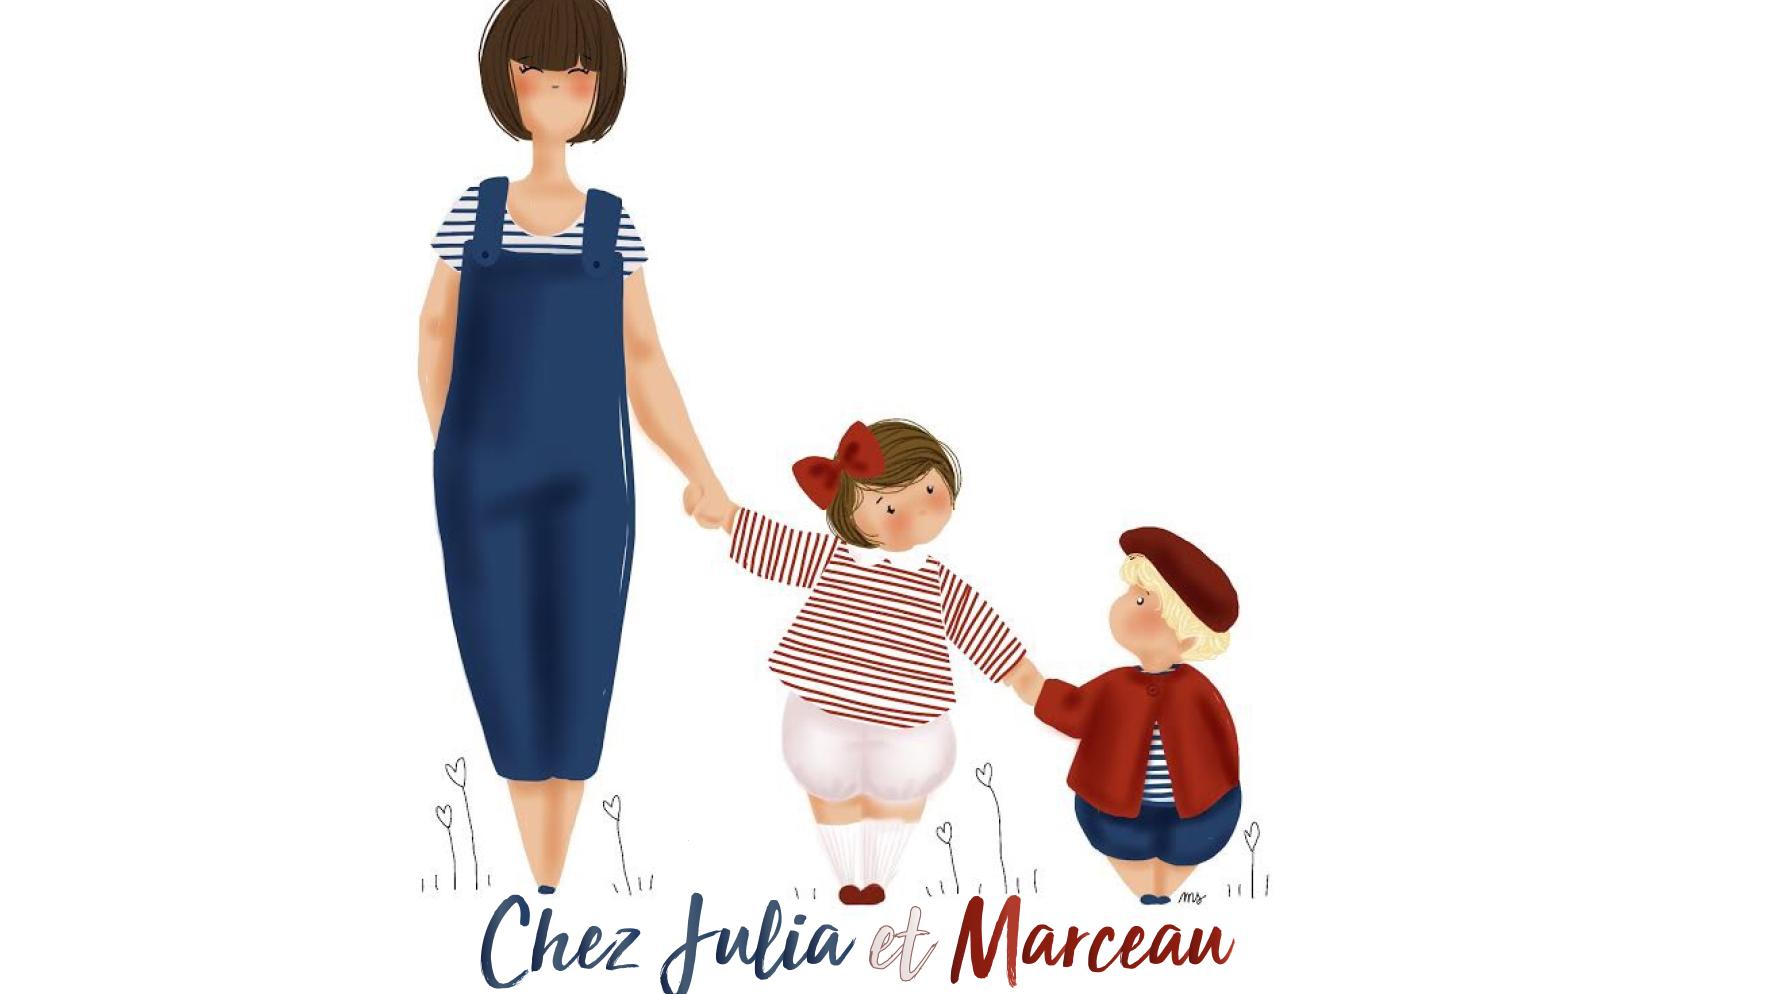 LOGO_-_Chez_Julia_et_Marceau-1523899792.jpg